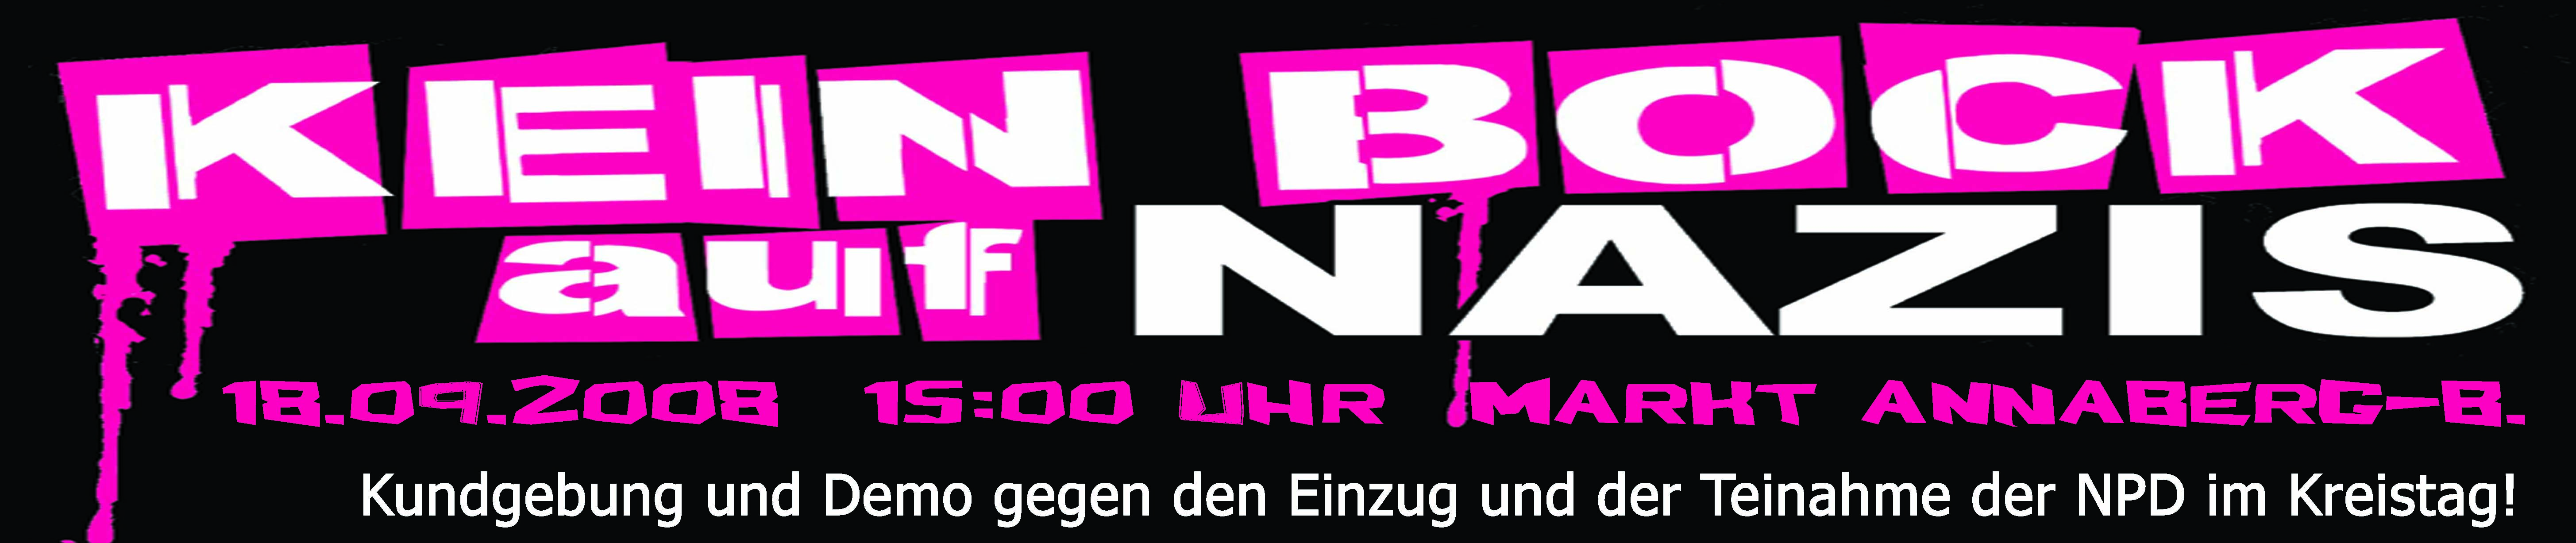 Banner Annaberg-B. 18.9.